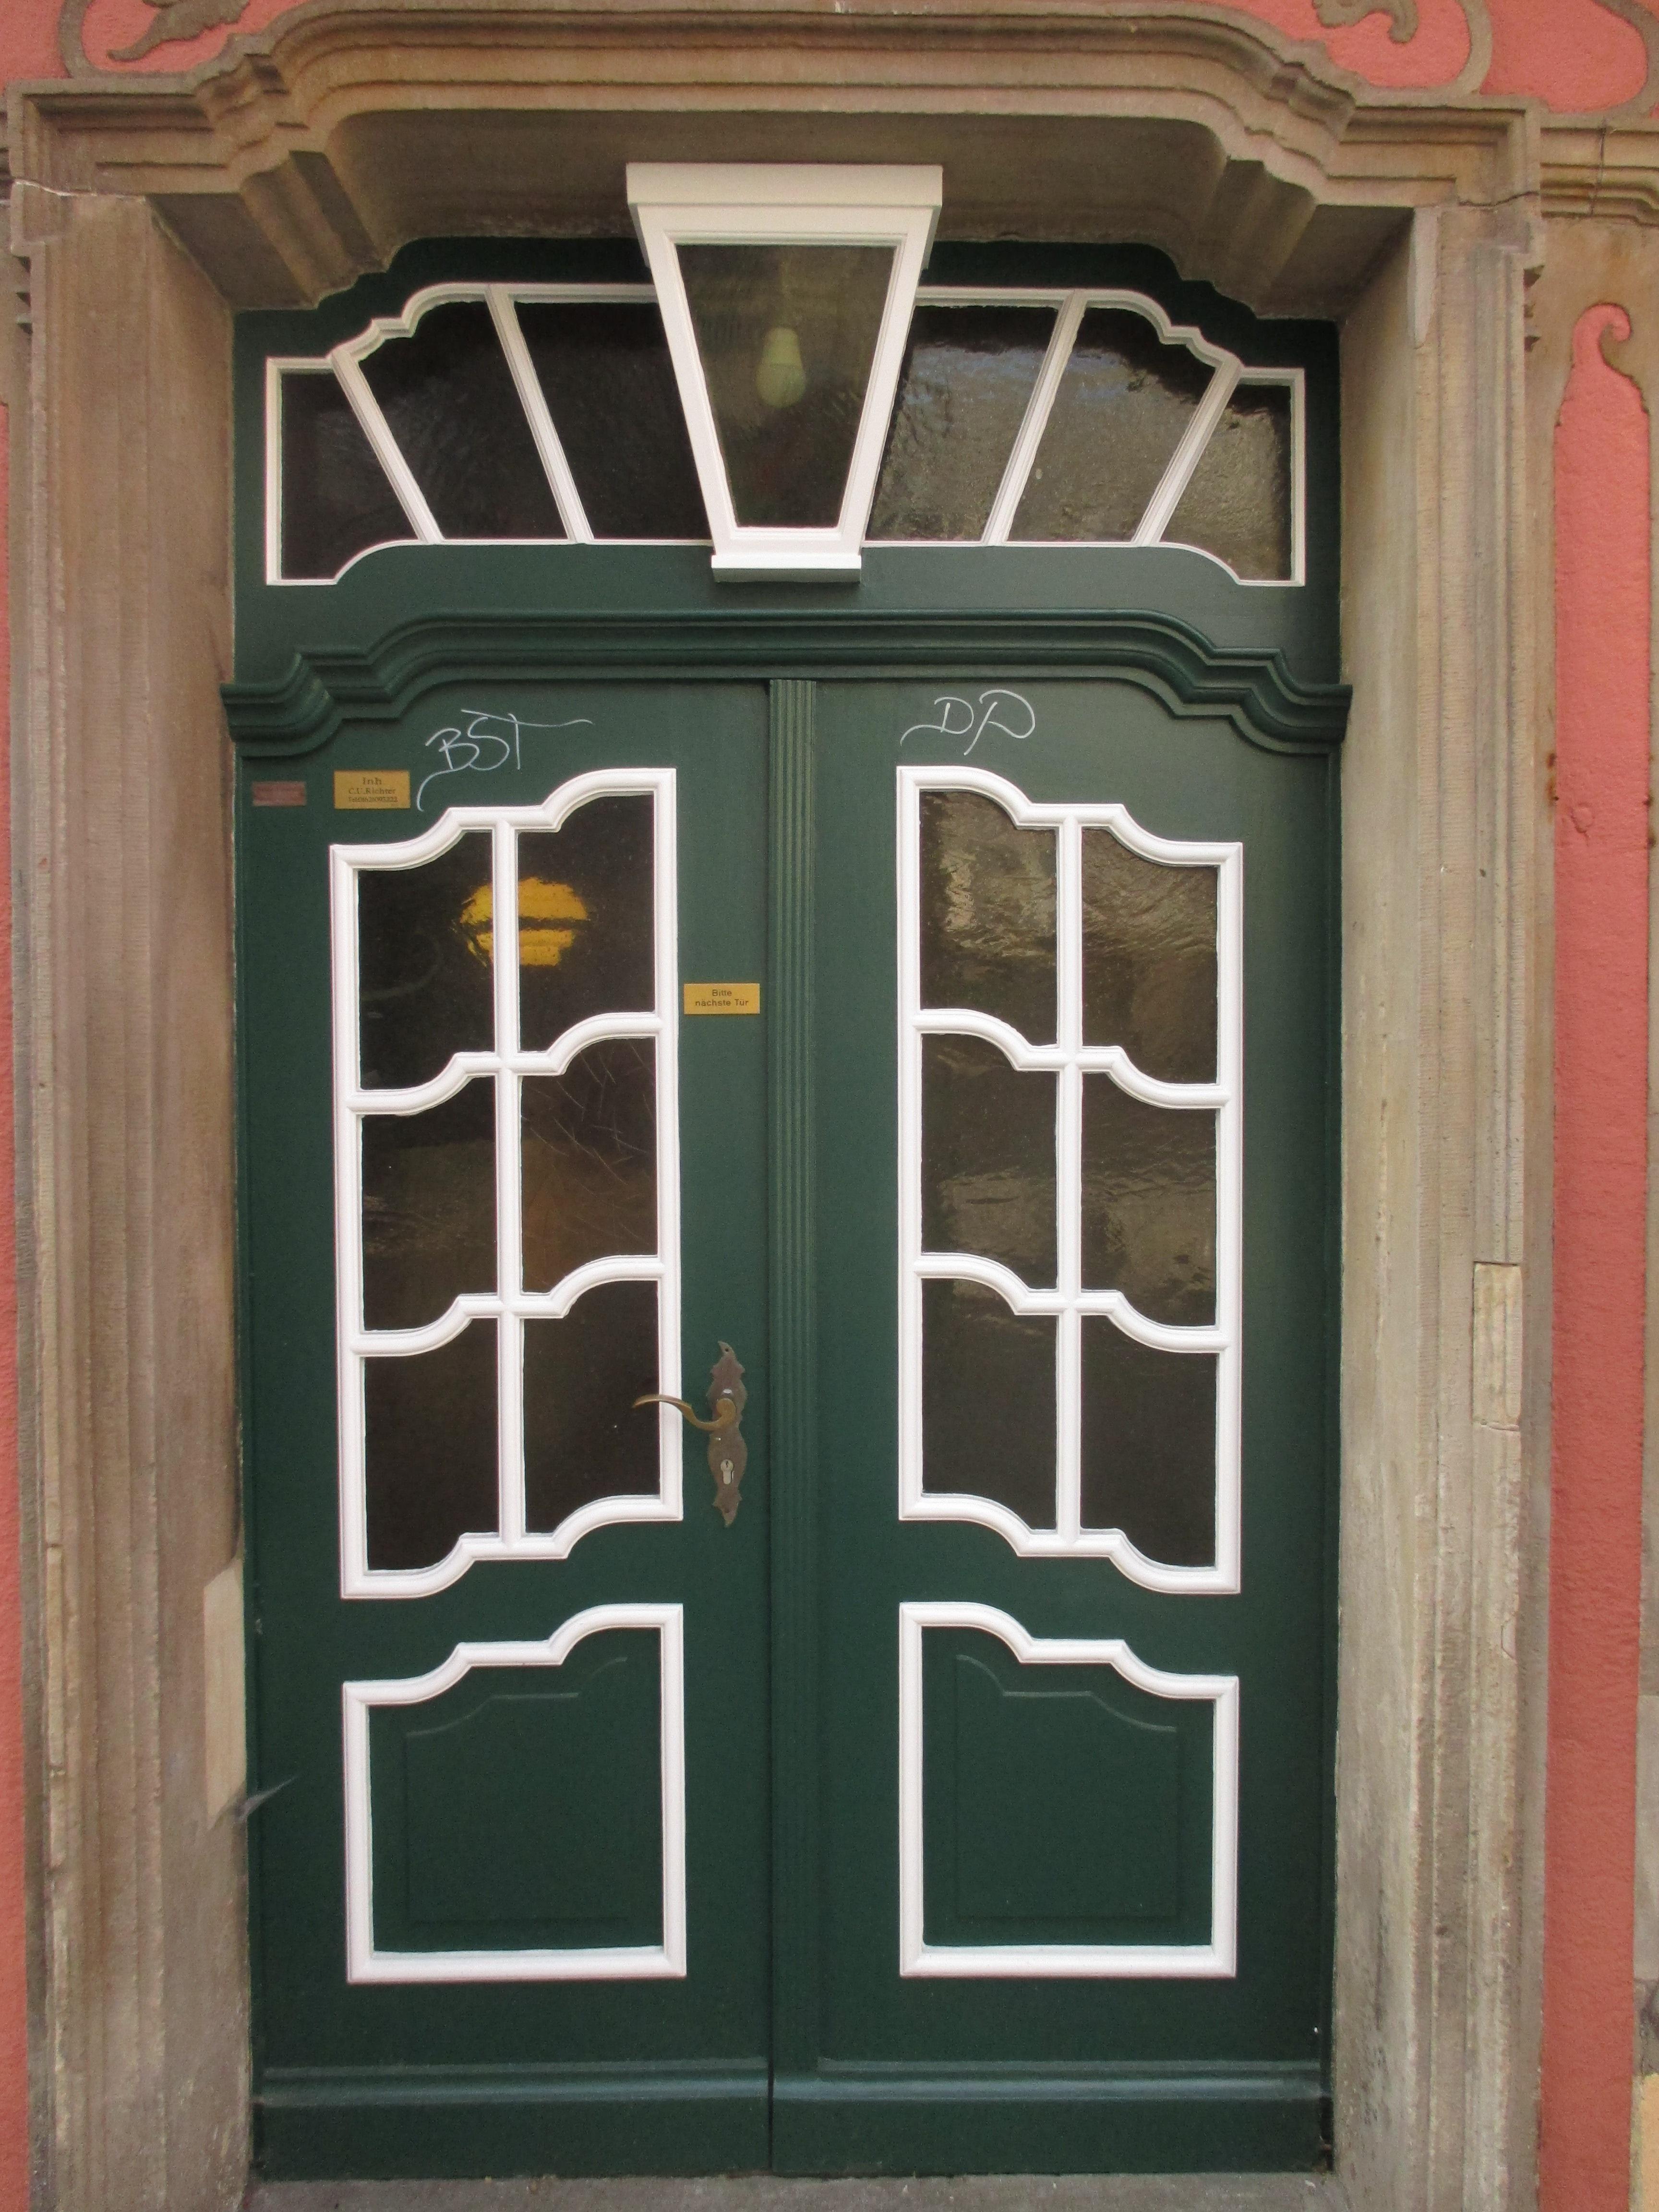 Haustür holz grün  Kostenlose foto : Holz, Villa, Fenster, alt, Grün, Fassade, Tür ...